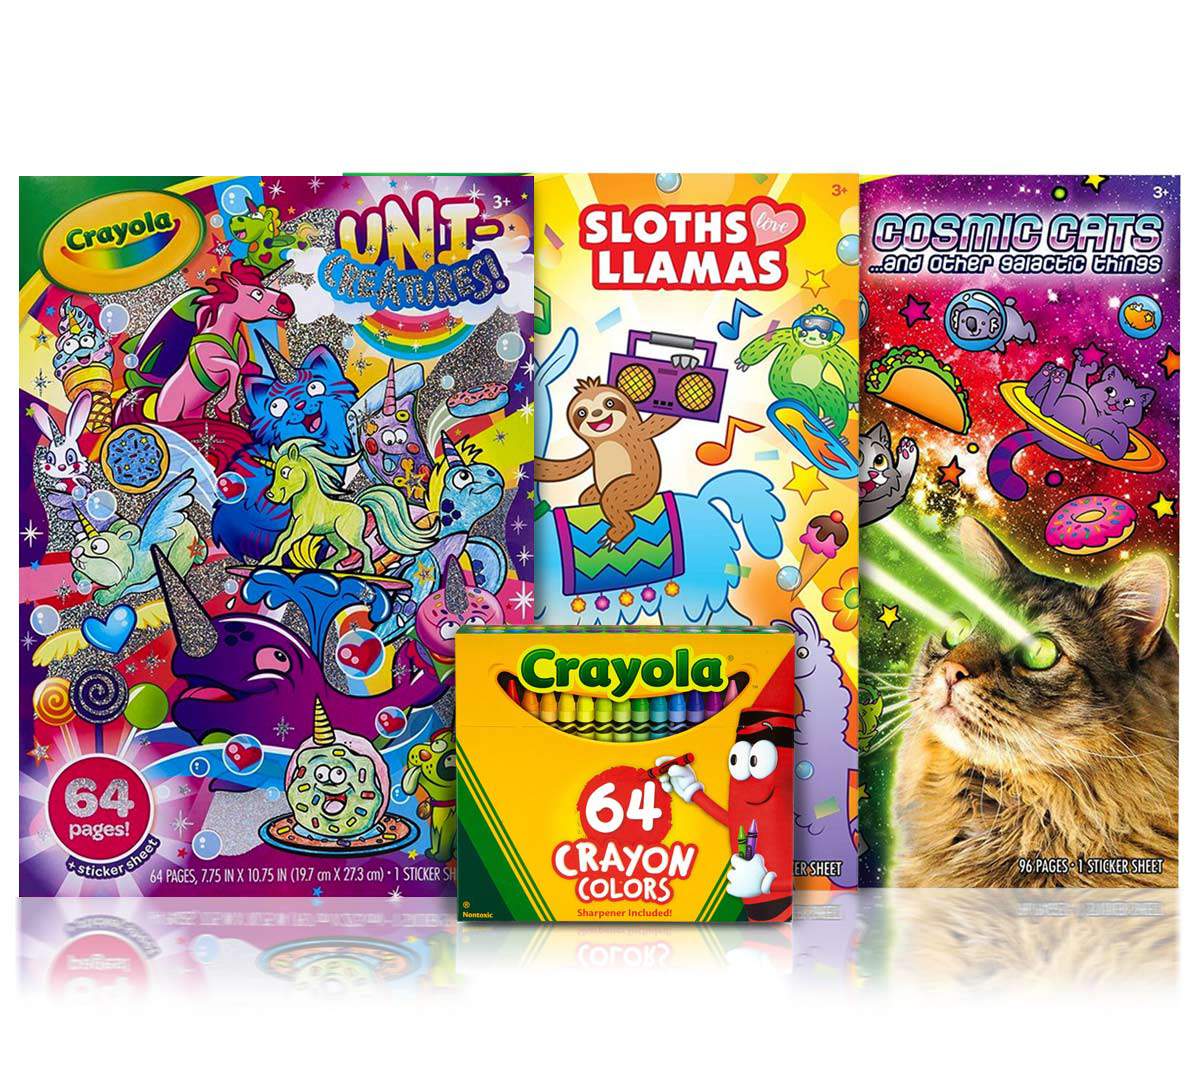 3 Animal Coloring Books with 64 Crayon Box | Crayola.com | Crayola